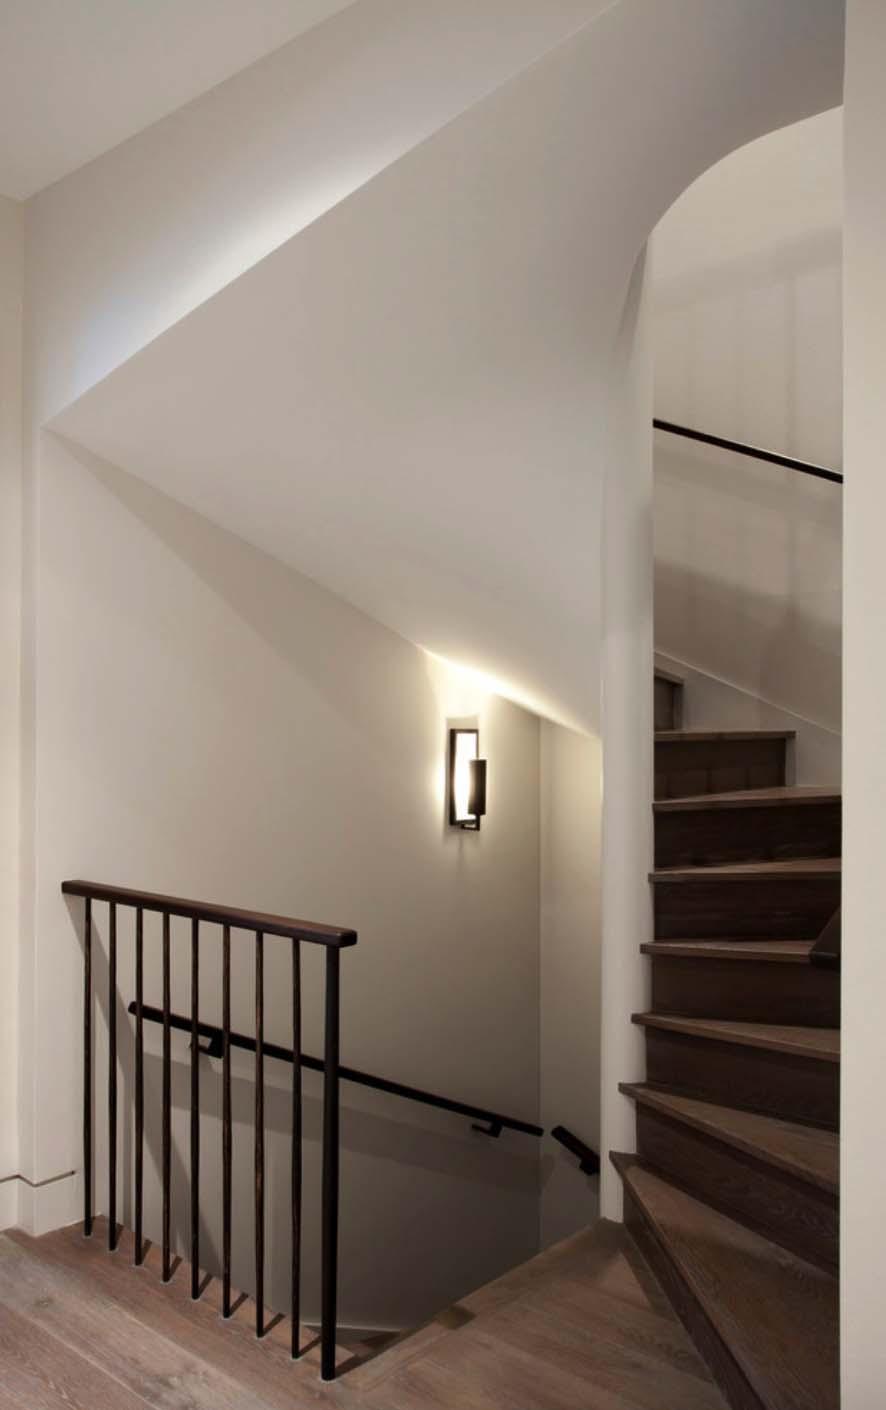 Maison contemporaine Design-Studio Gild-11-1 Kindesign